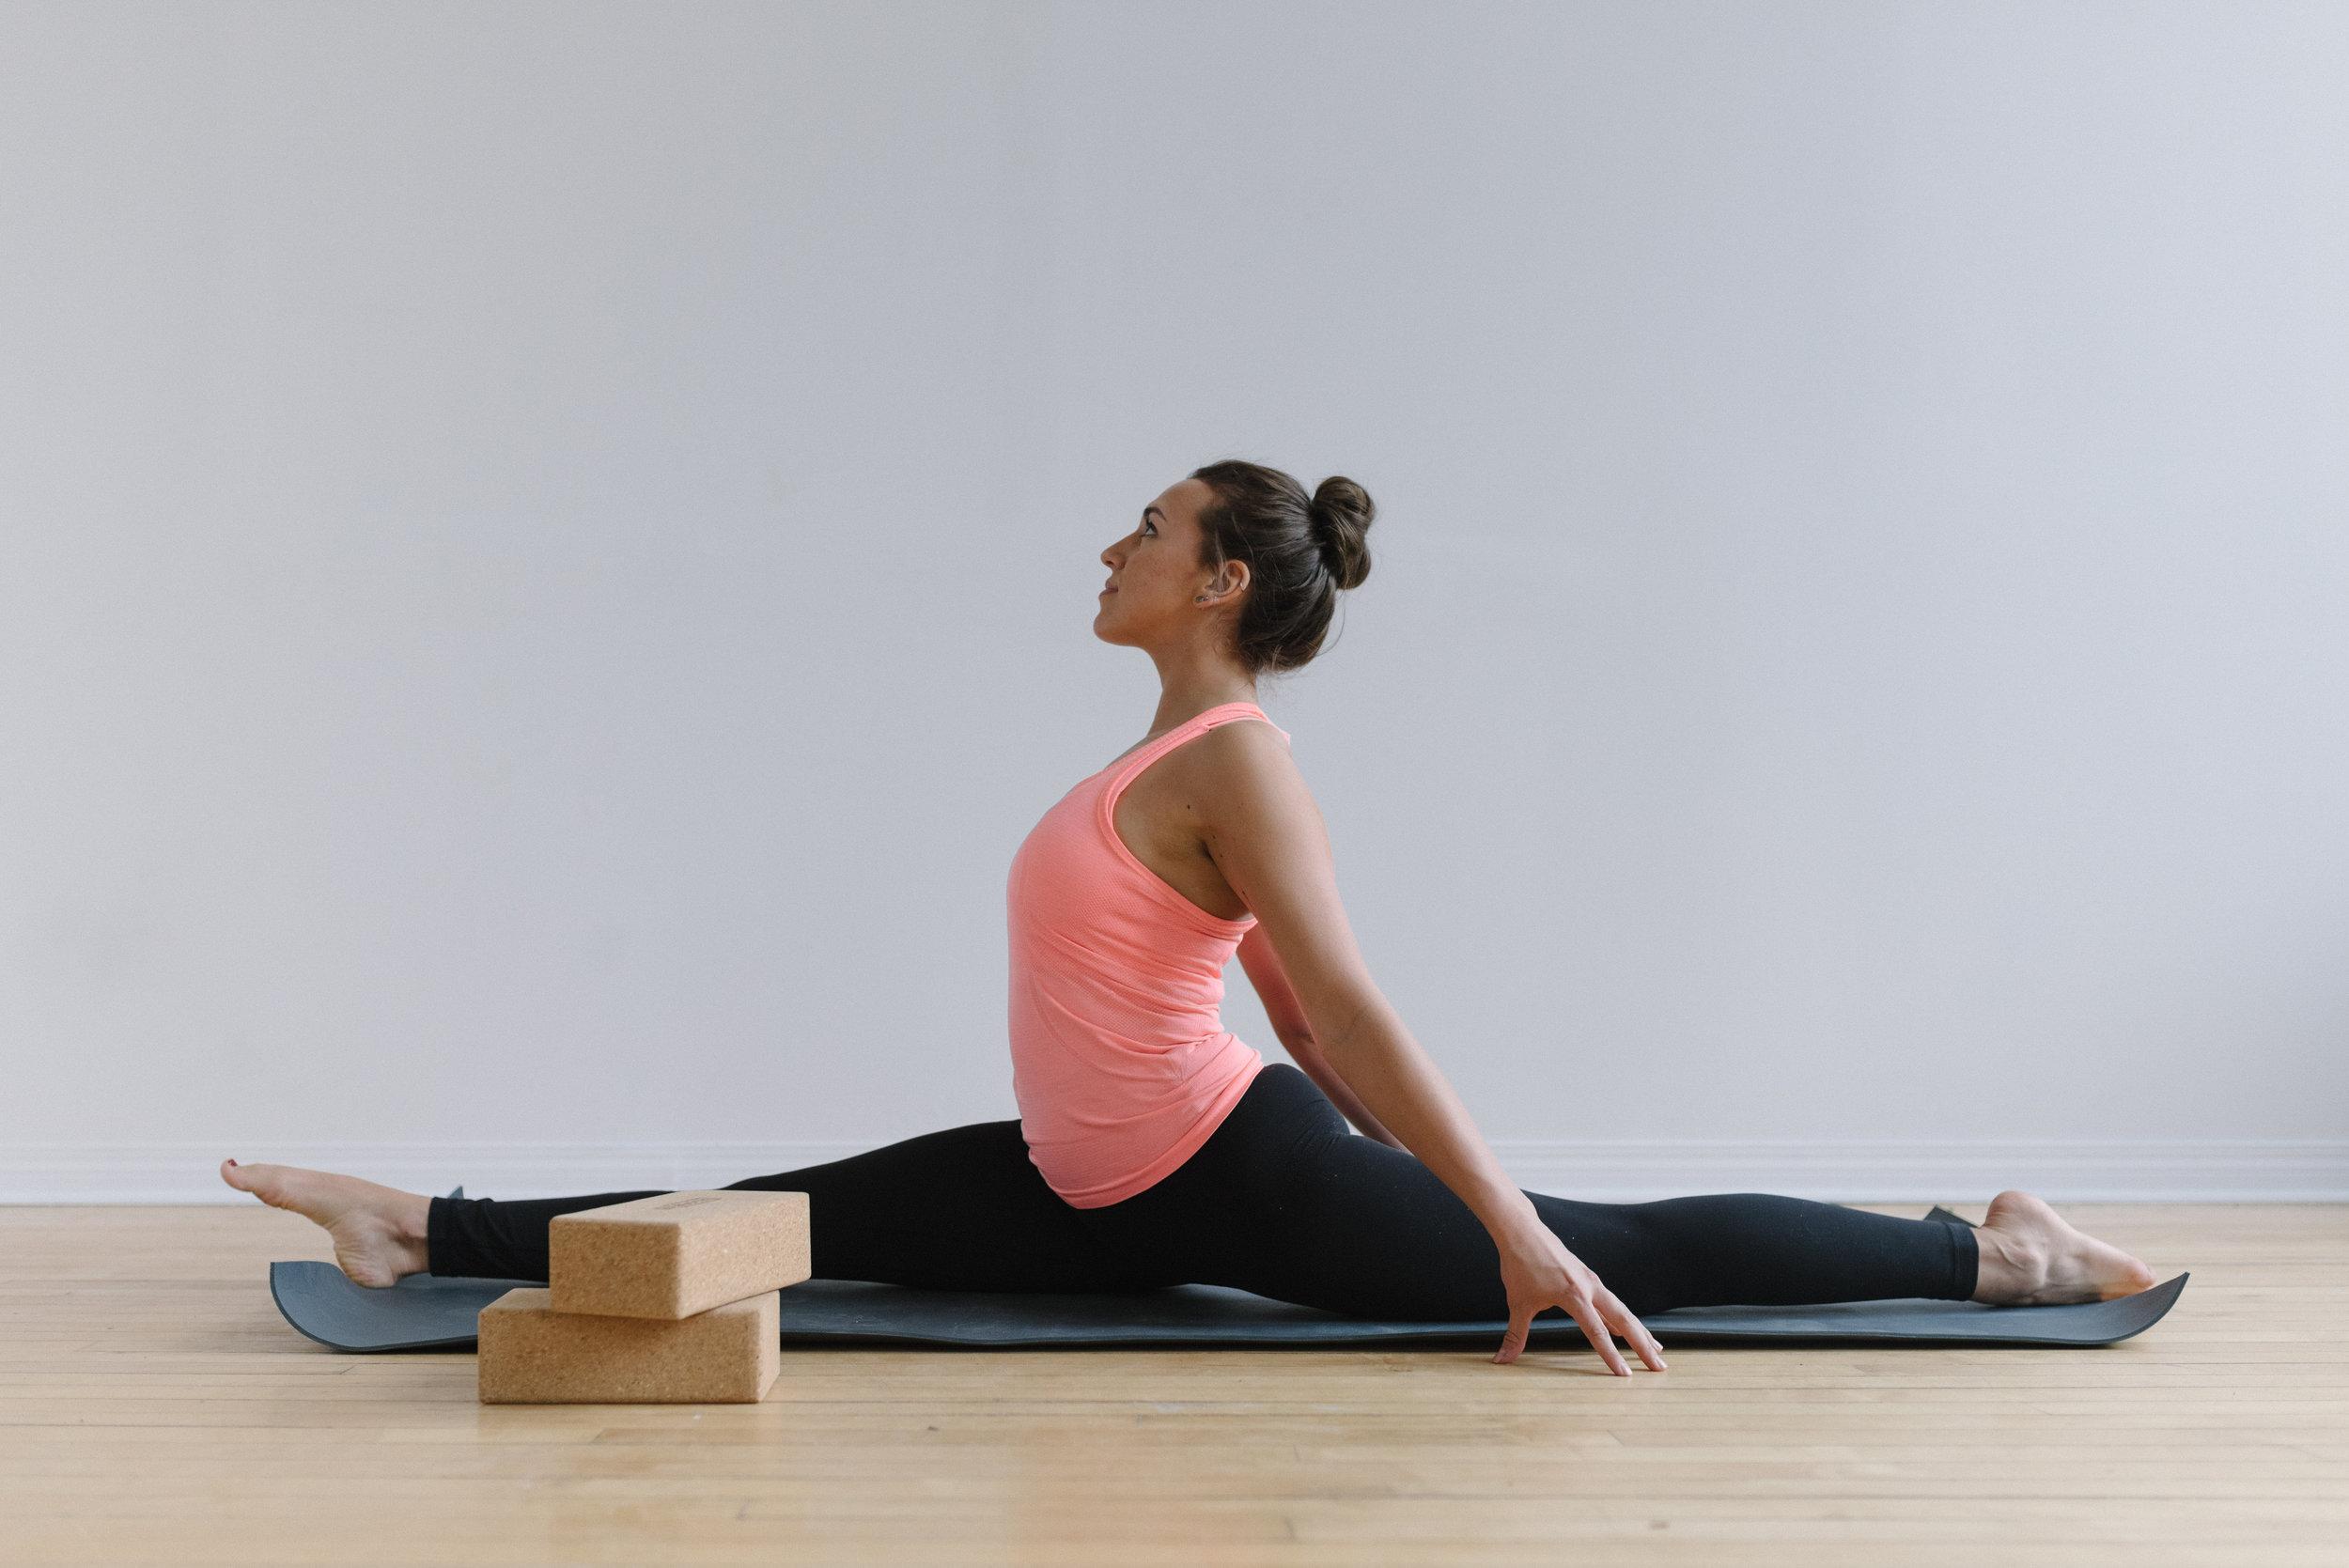 Sam+D+Squire+_+Yoga+_+Meditation+_+Splits+_+Yoga+Pose+_+Yoga+Sequence+_+At-Home+Yoga (10).jpeg